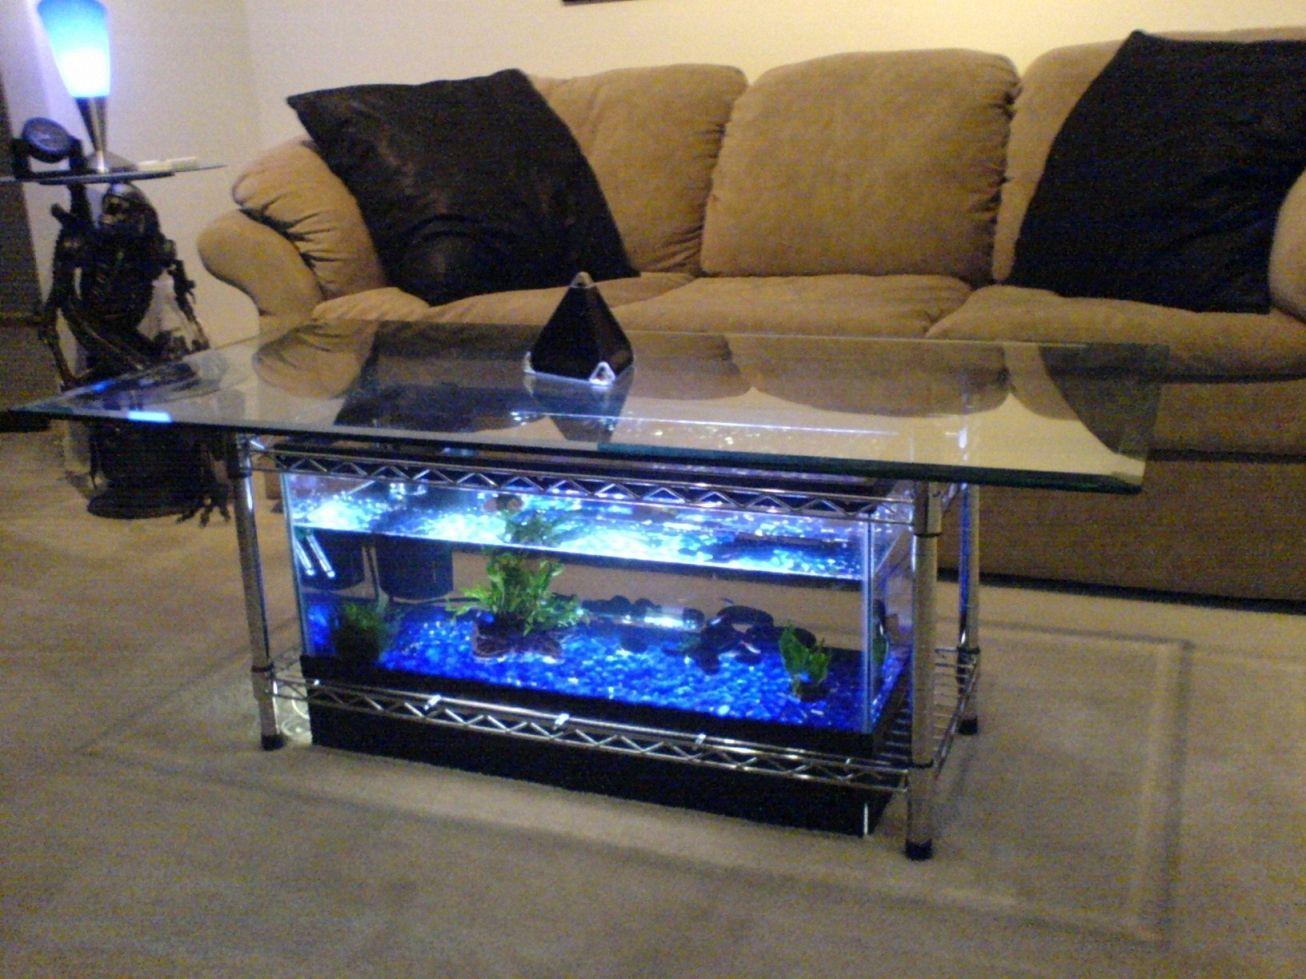 Aquarium coffee table aquariums coffee and fish tanks aquarium coffee table geotapseo Image collections